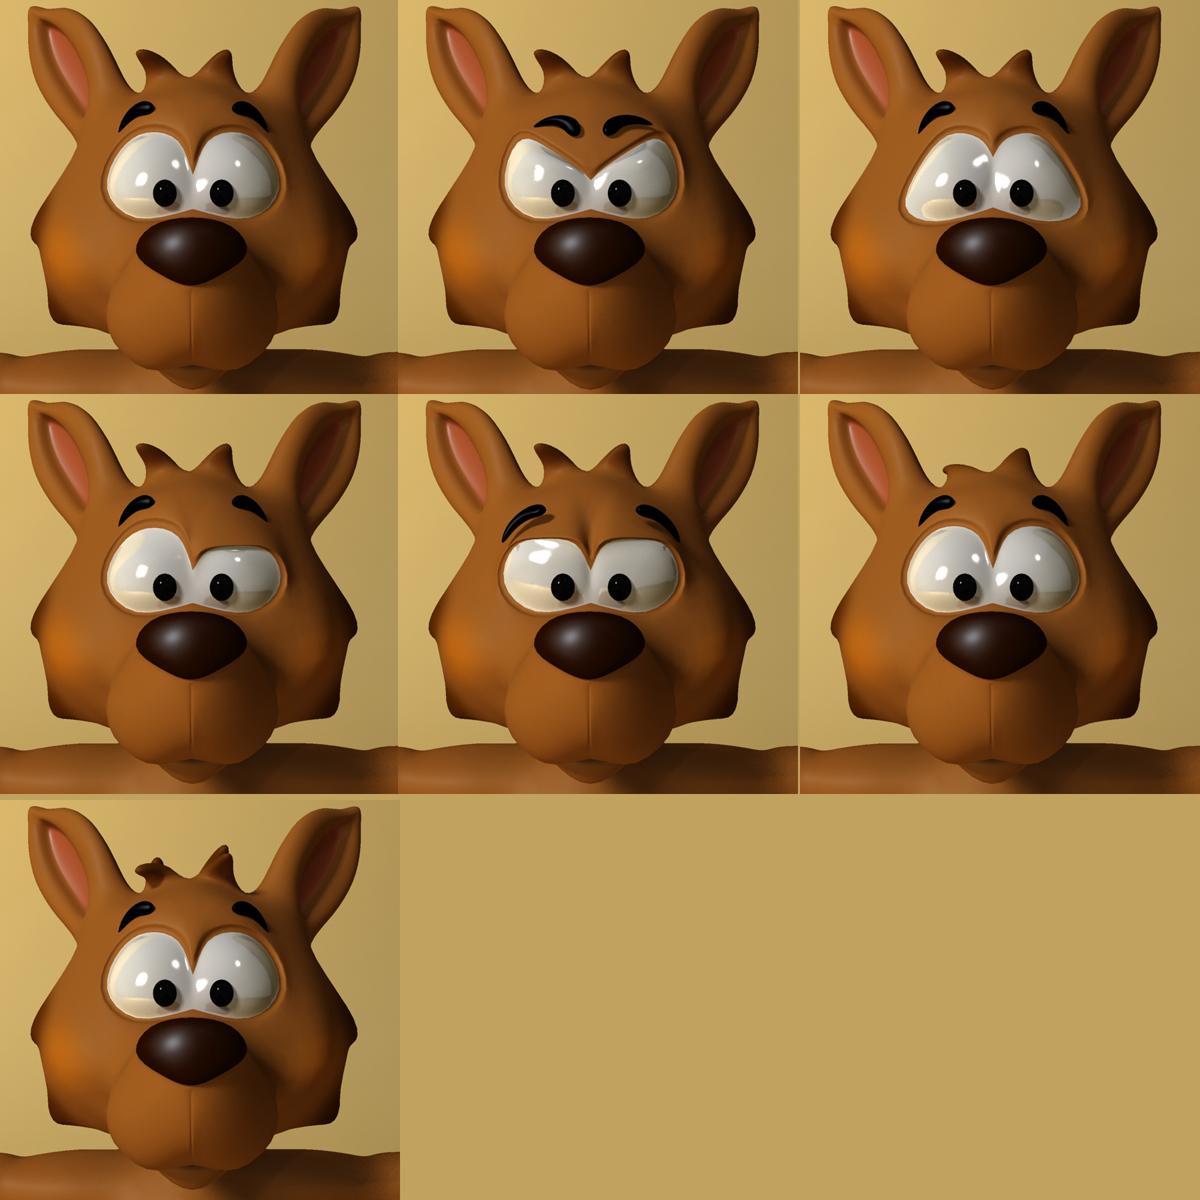 cartoon kangaroo rigged and animated 3d model max fbx  obj 220173